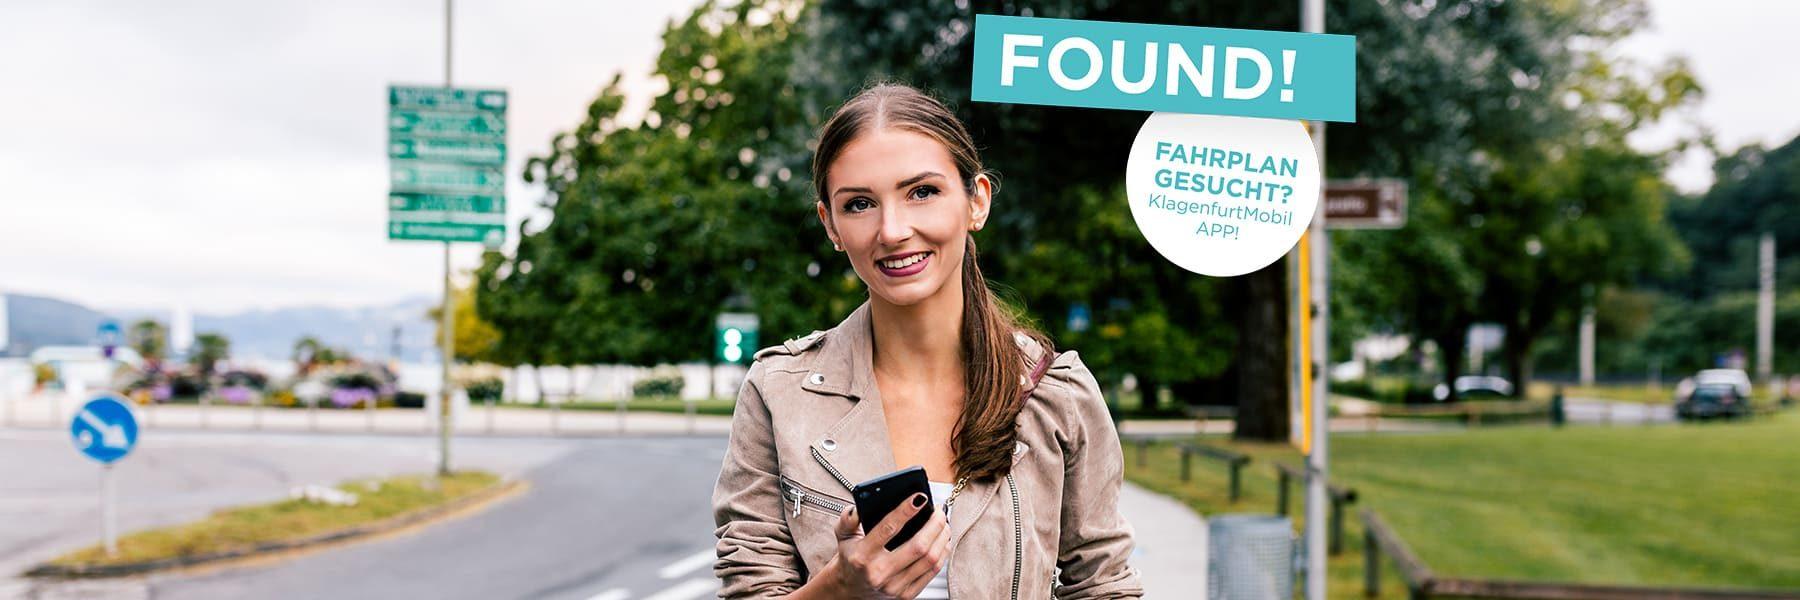 slider-fahrplan-gesucht-klagenfurt-mobil-app